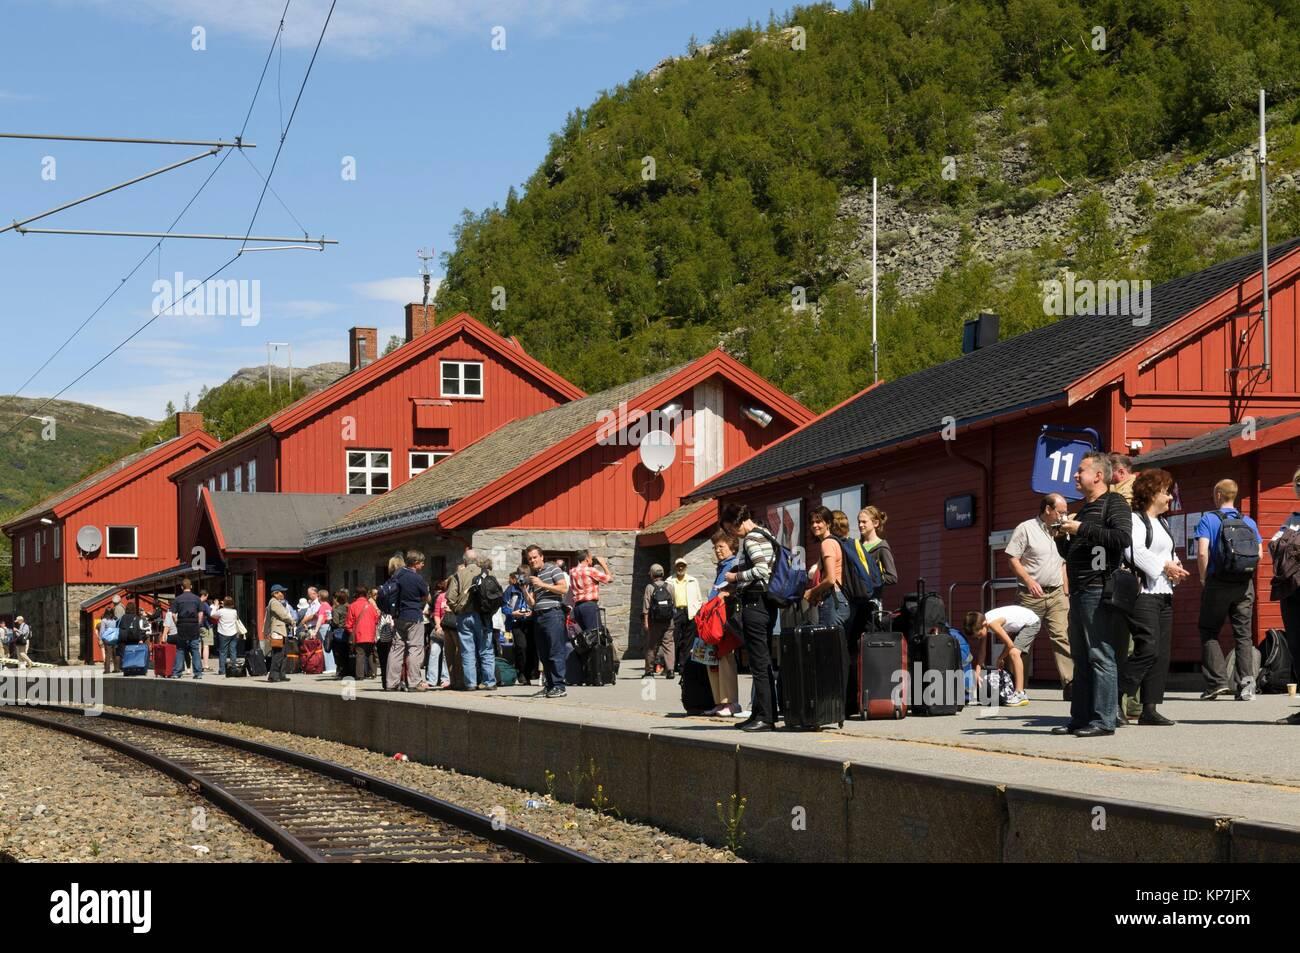 Myrdal Station, Flåm Railway (Flåmsbana, the train runs through spectacular scenery, alongside the Rallar - Stock Image